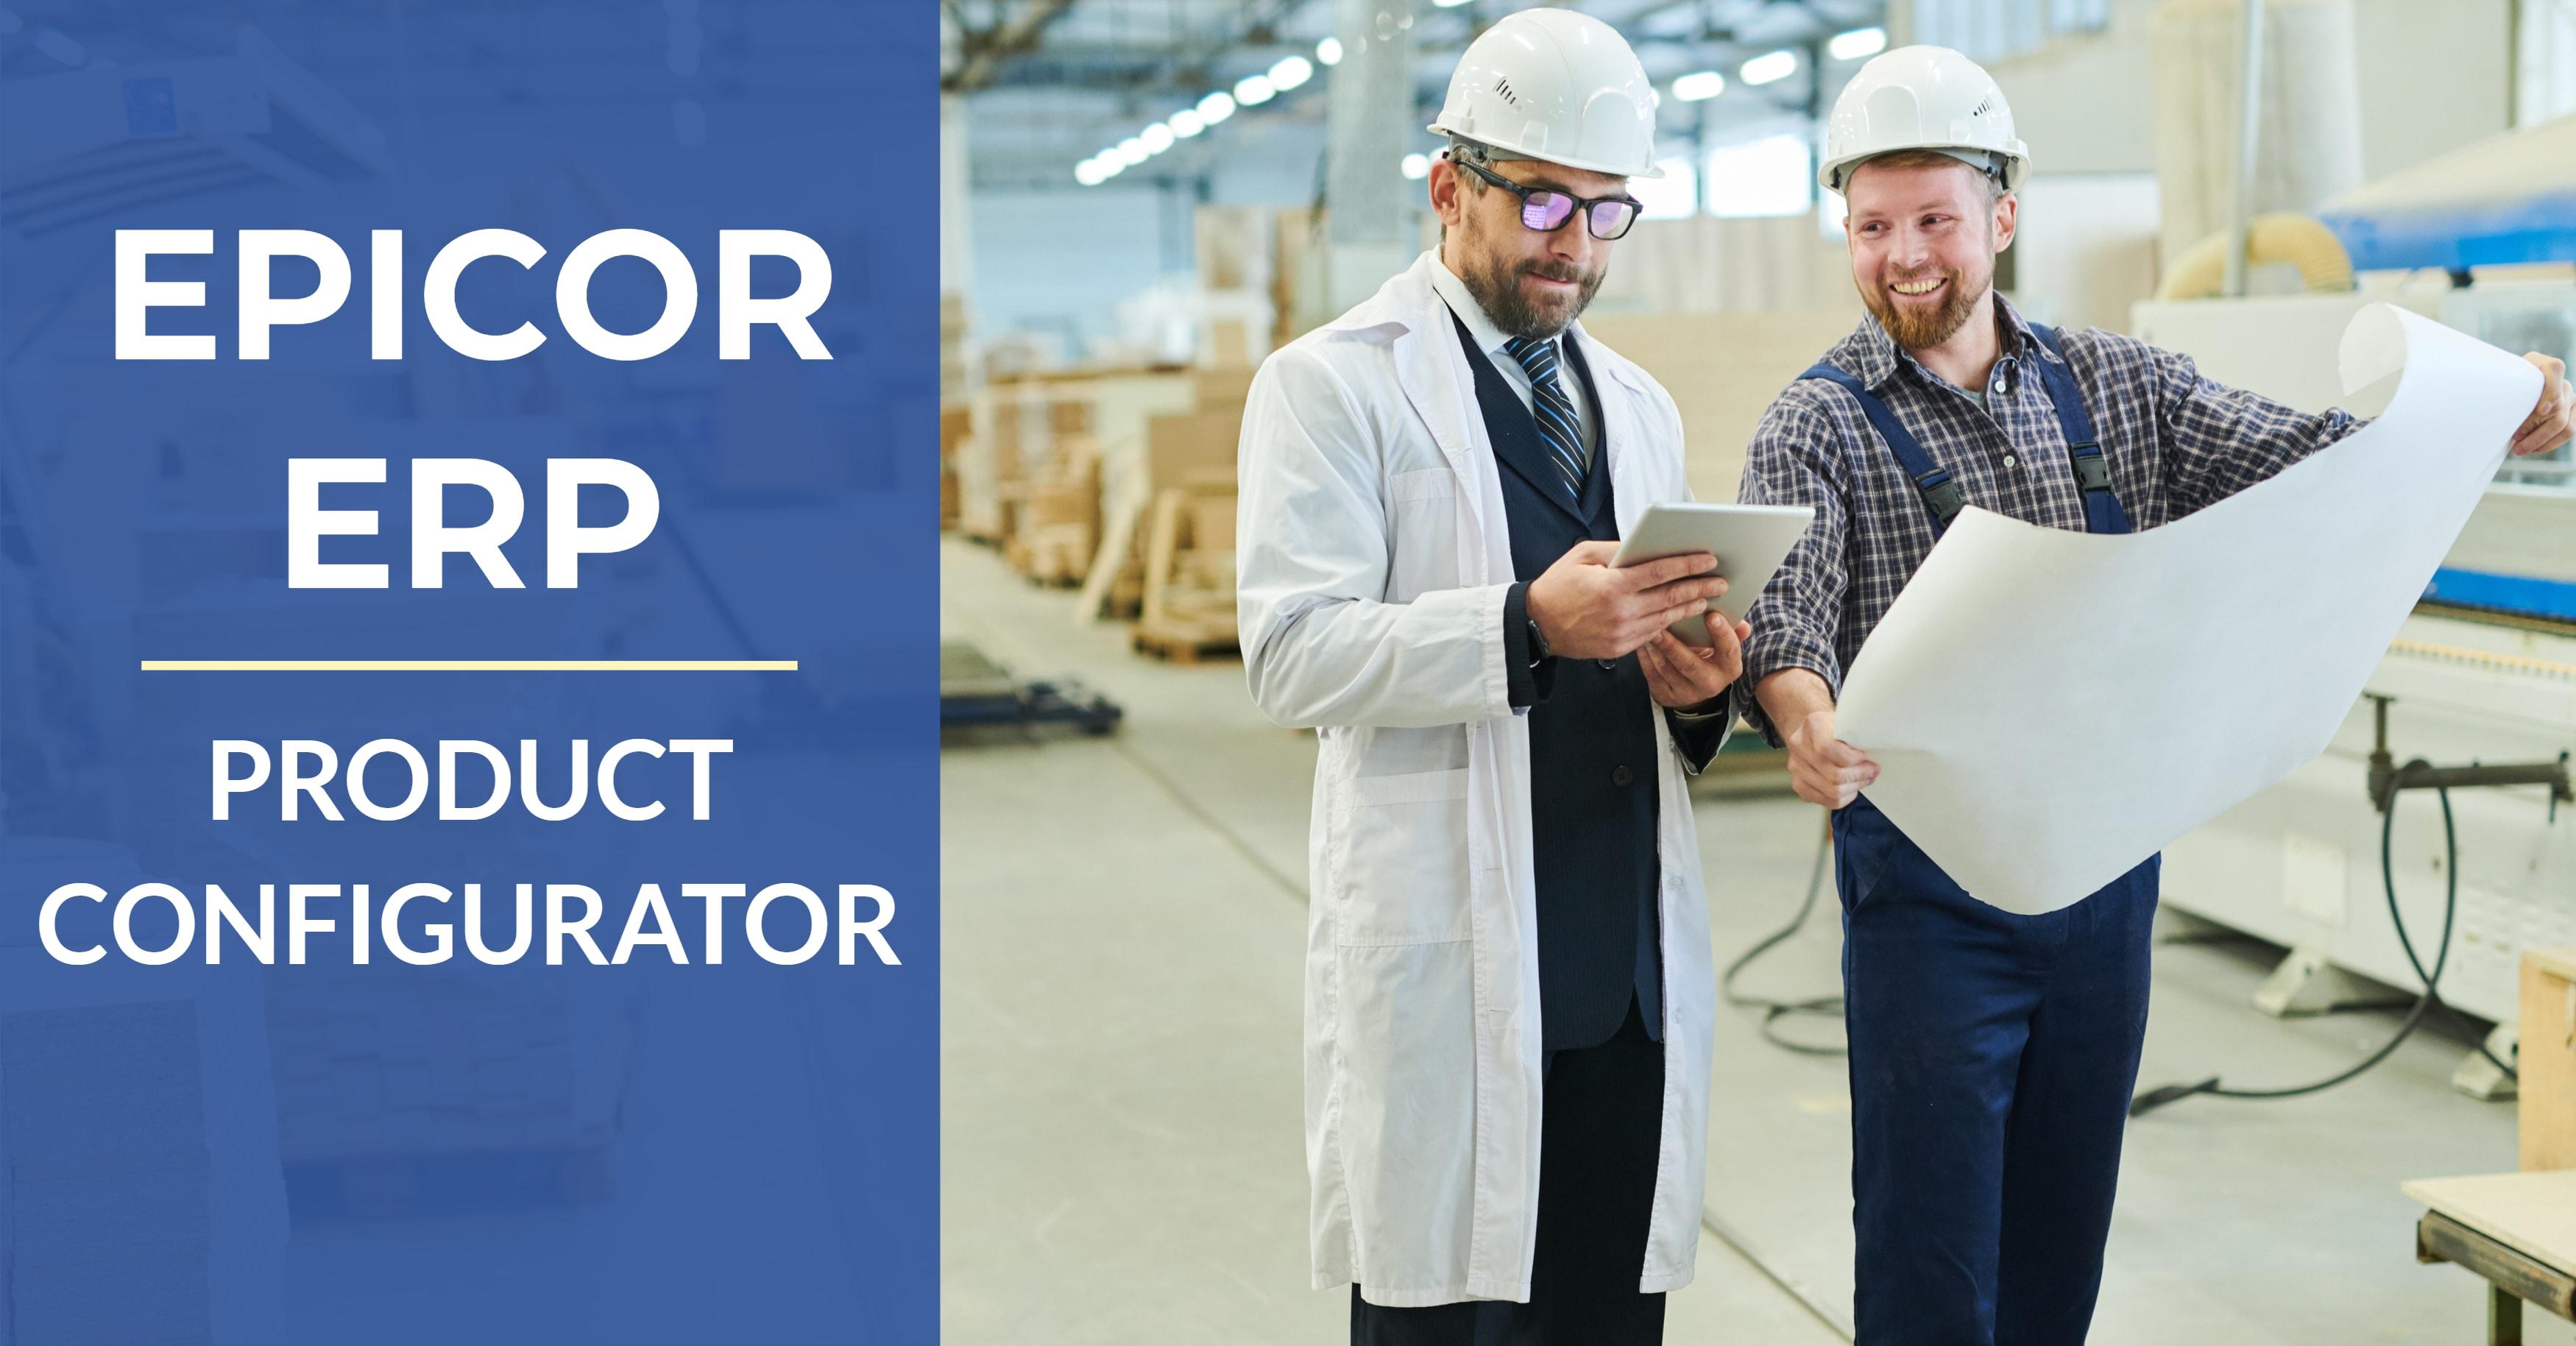 Epicor Product Configurator